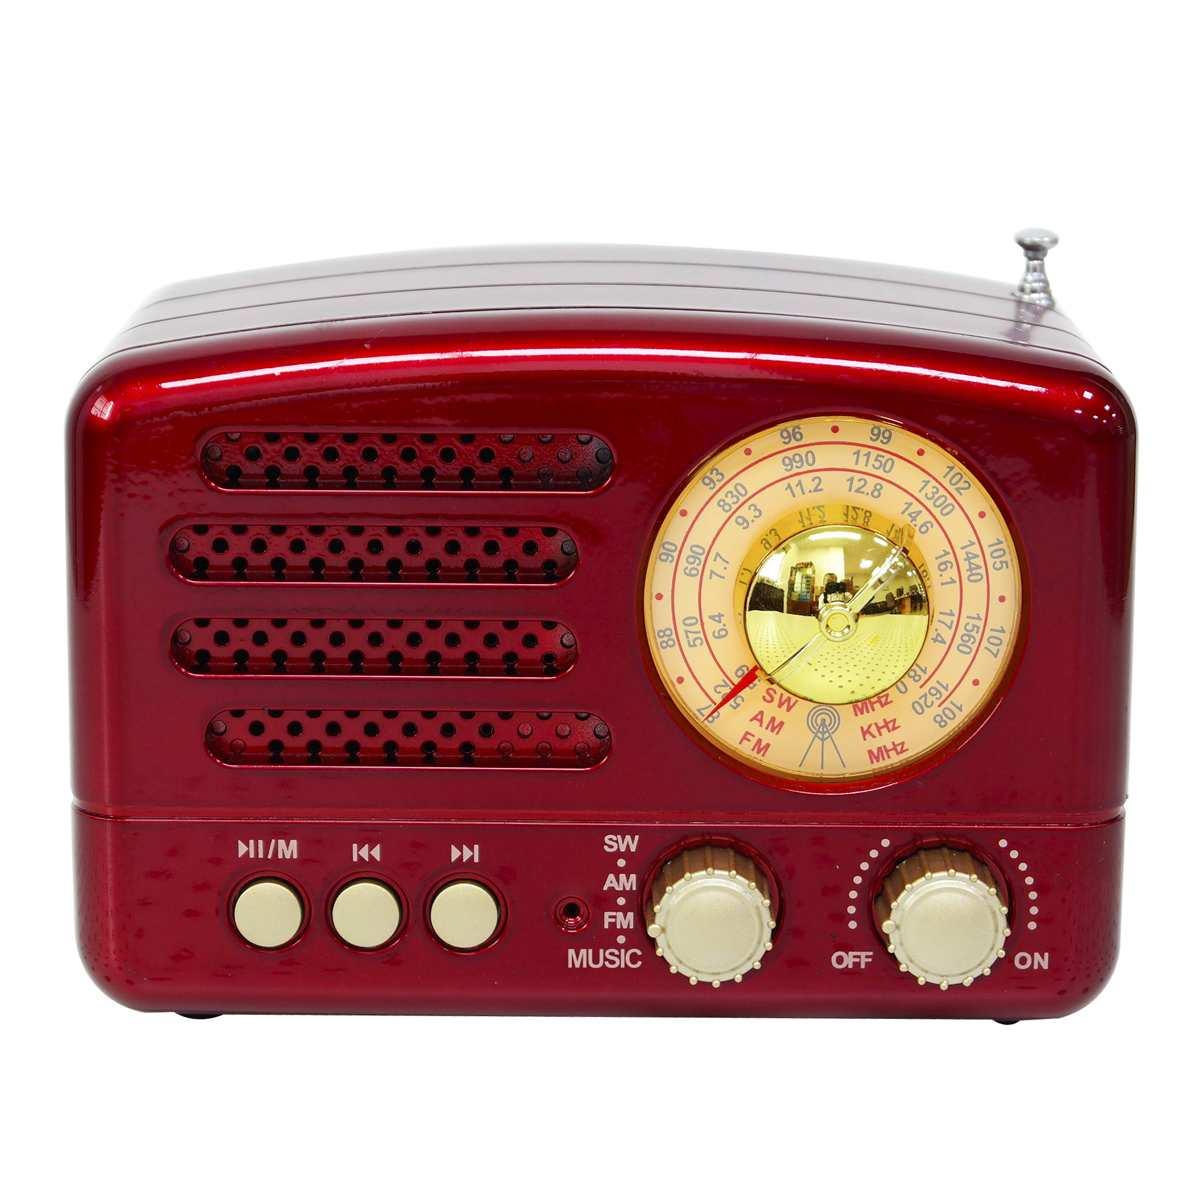 130x90x70mm Rot/Kaffee Tragbare Vintage Retro Radio AM FM SW bluetooth Lautsprecher TF Karte slot USB Lade Home Reise Mini Radio